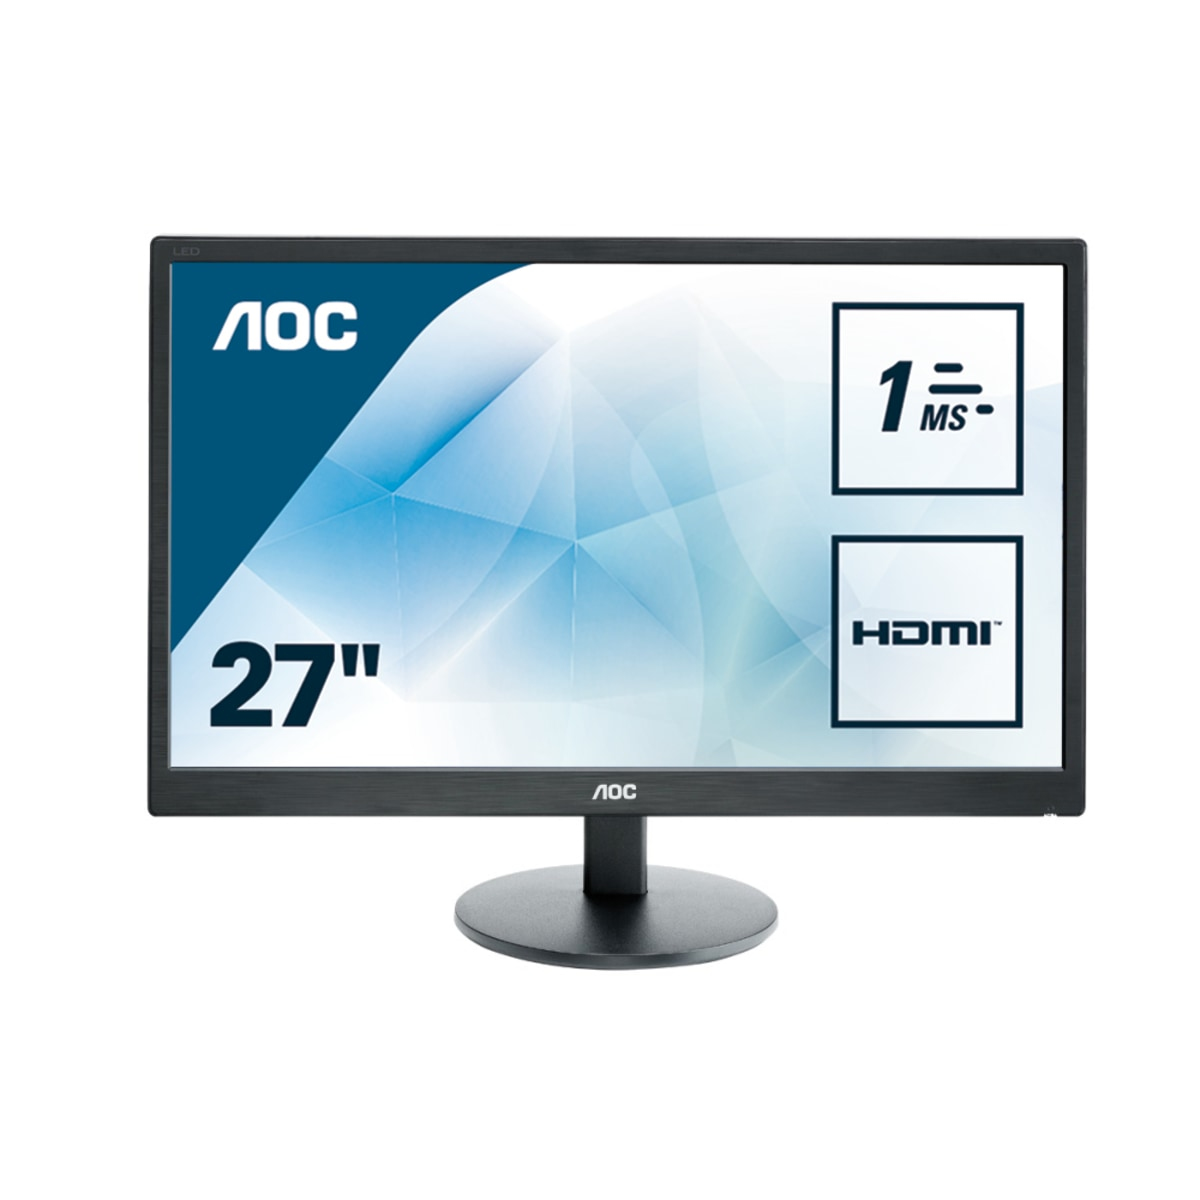 "AOC Value-line E2770SH LED display 68.6 cm (27"") Full HD Flat Matt Black"